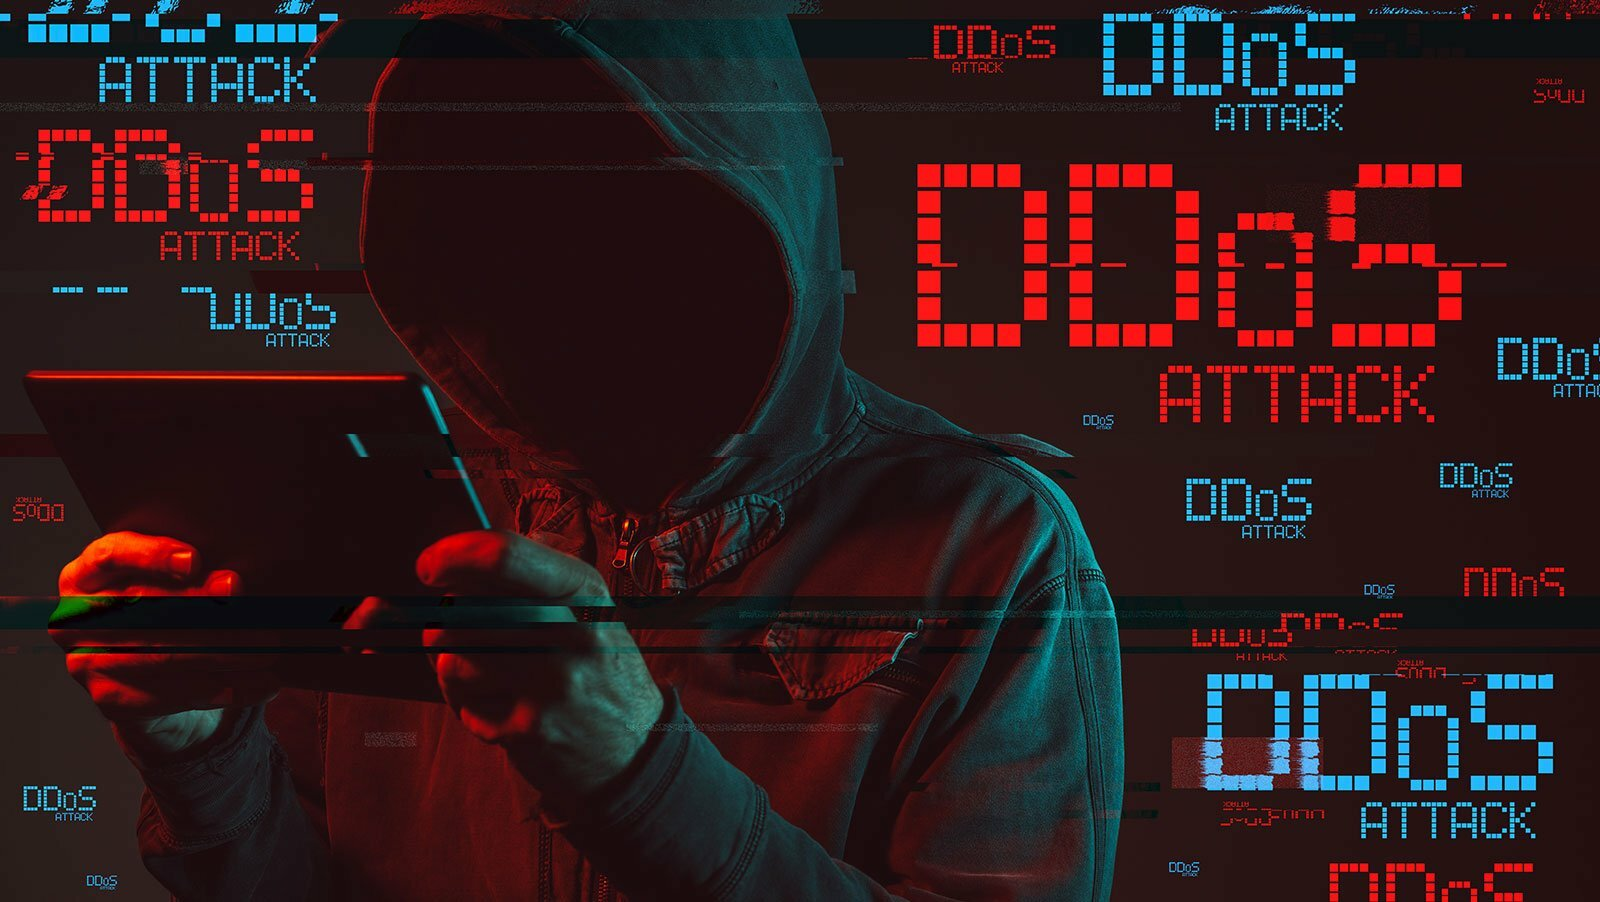 Картинка Связь между карантином и DDoS-атаками